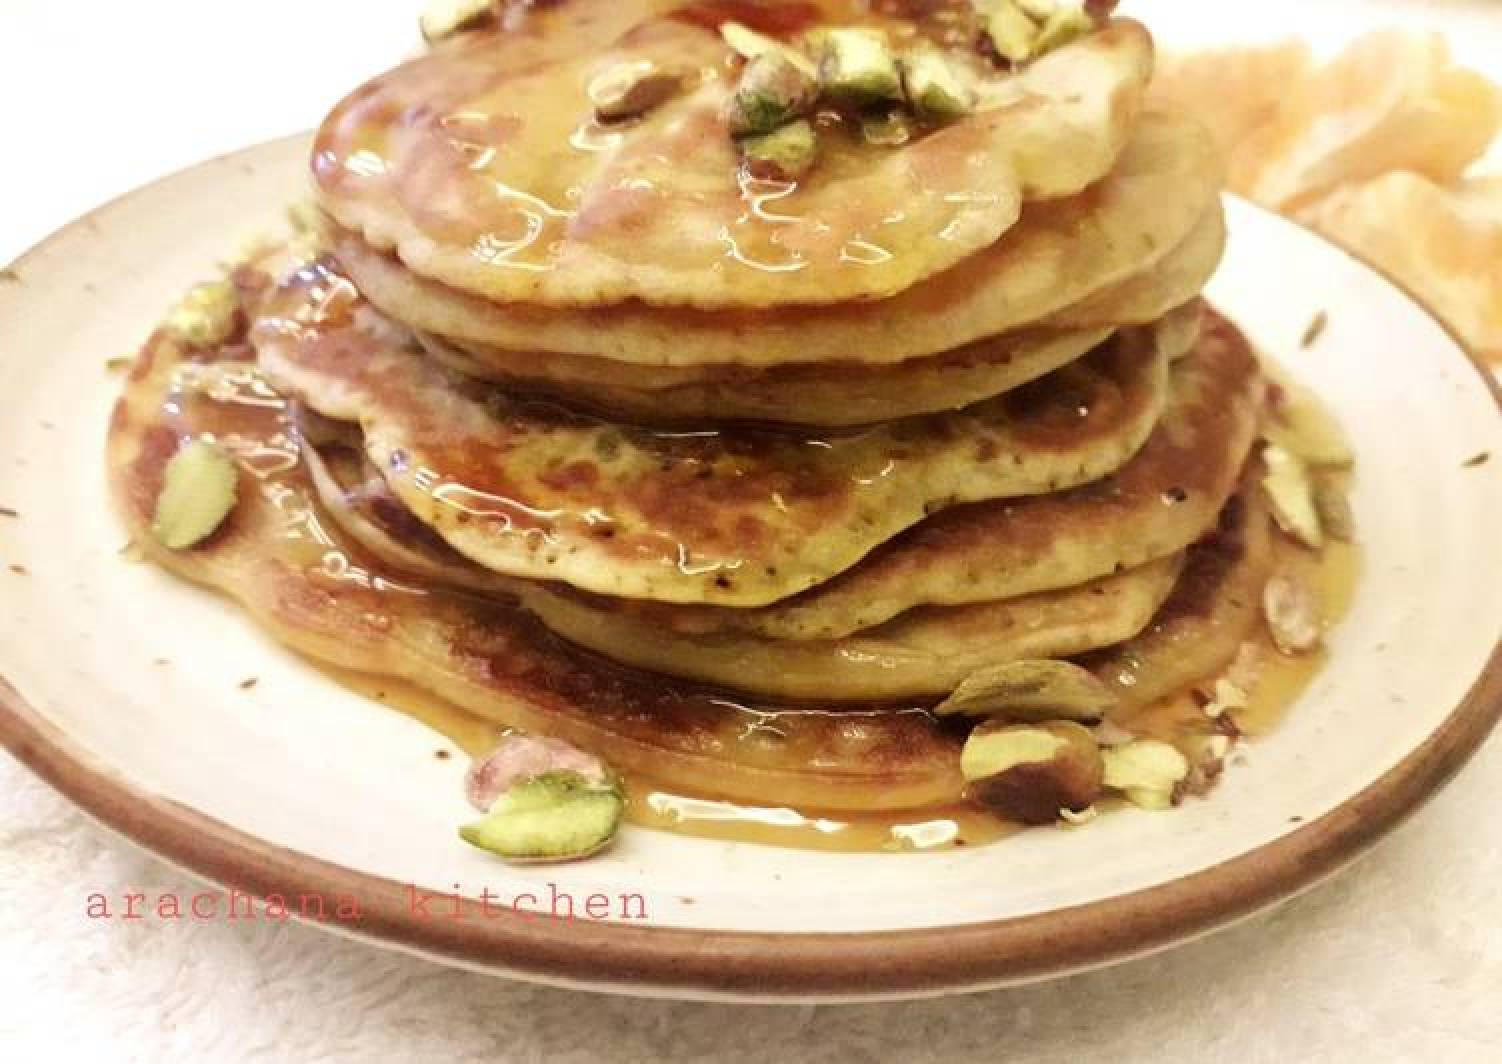 Orange wheat pistachio pancakes kids special recipe